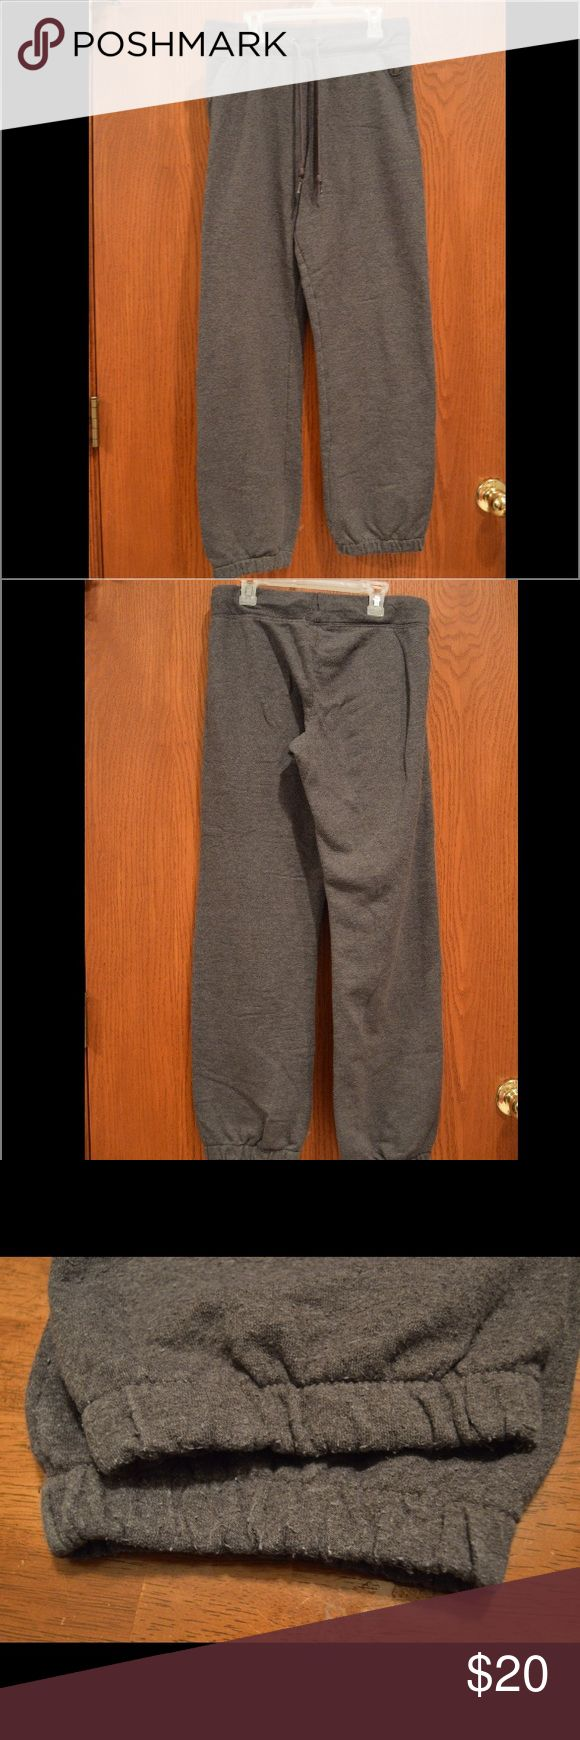 🎄SALE🎄Champion men's athletic pants Athletic pants, drawstring waistband, no pockets, hardly worn. Was $20 now $10 Pants Sweatpants & Joggers